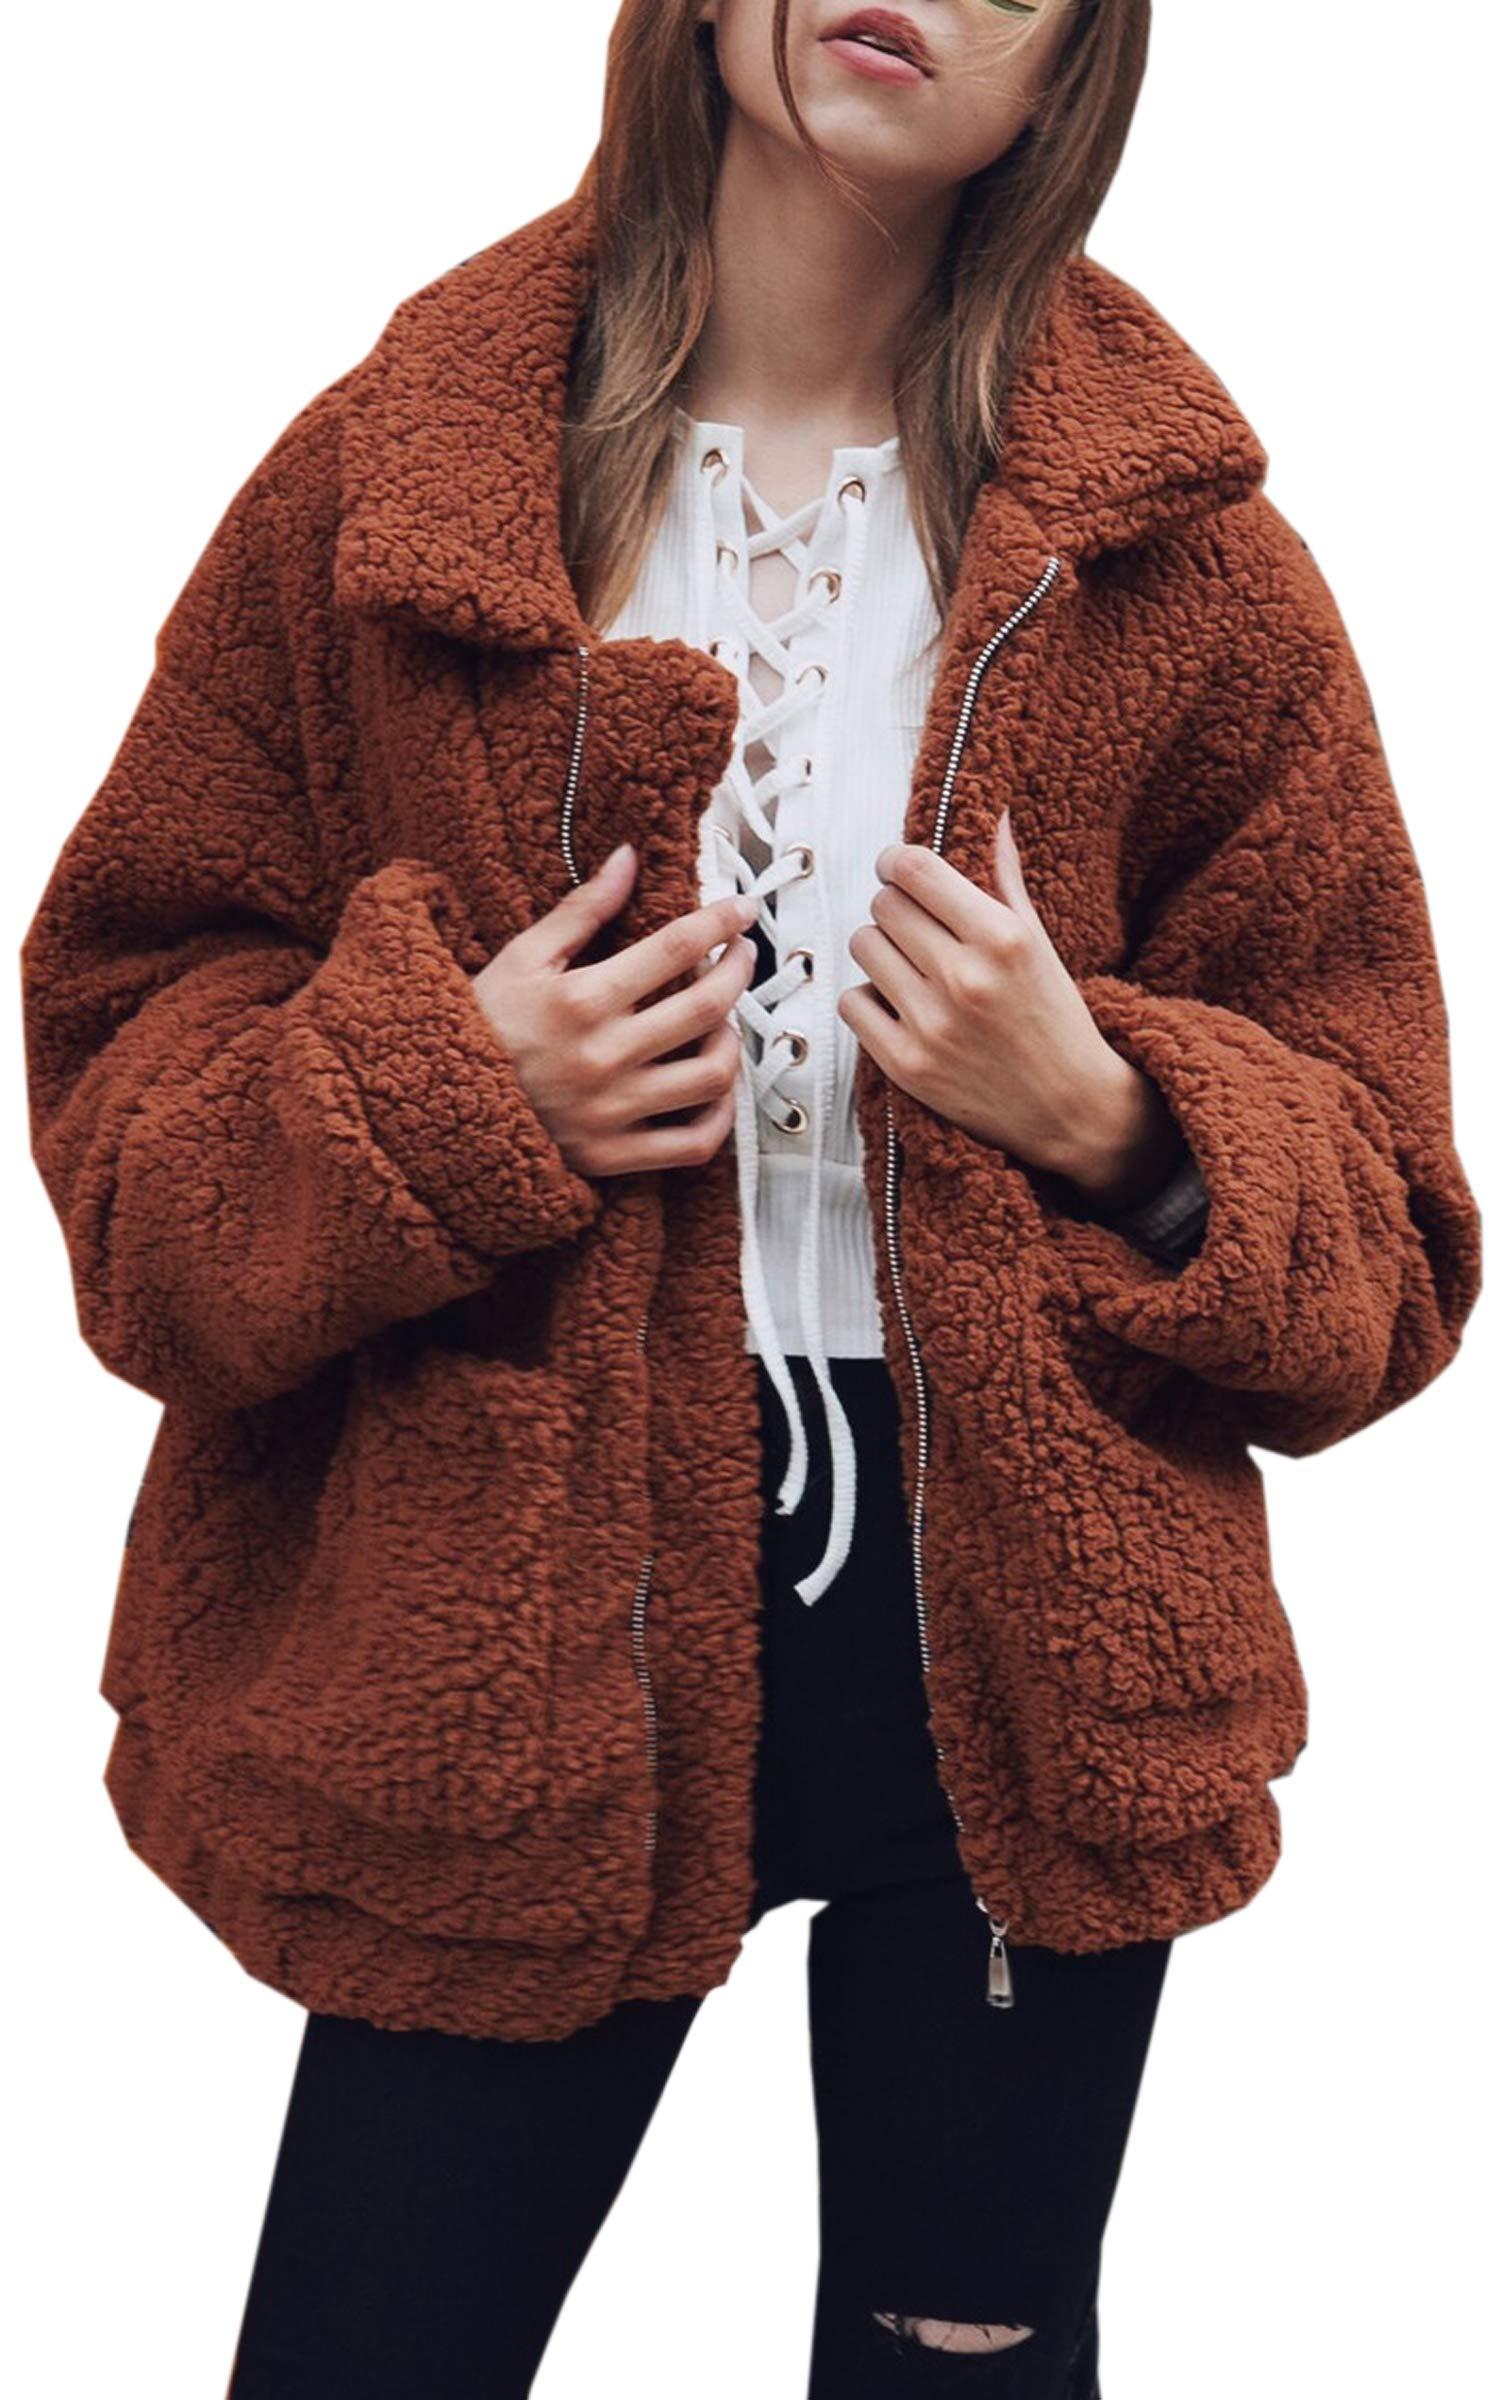 Hibluco Women's Long Sleeve Lapel Faux Fur Zip up Fleece Coat